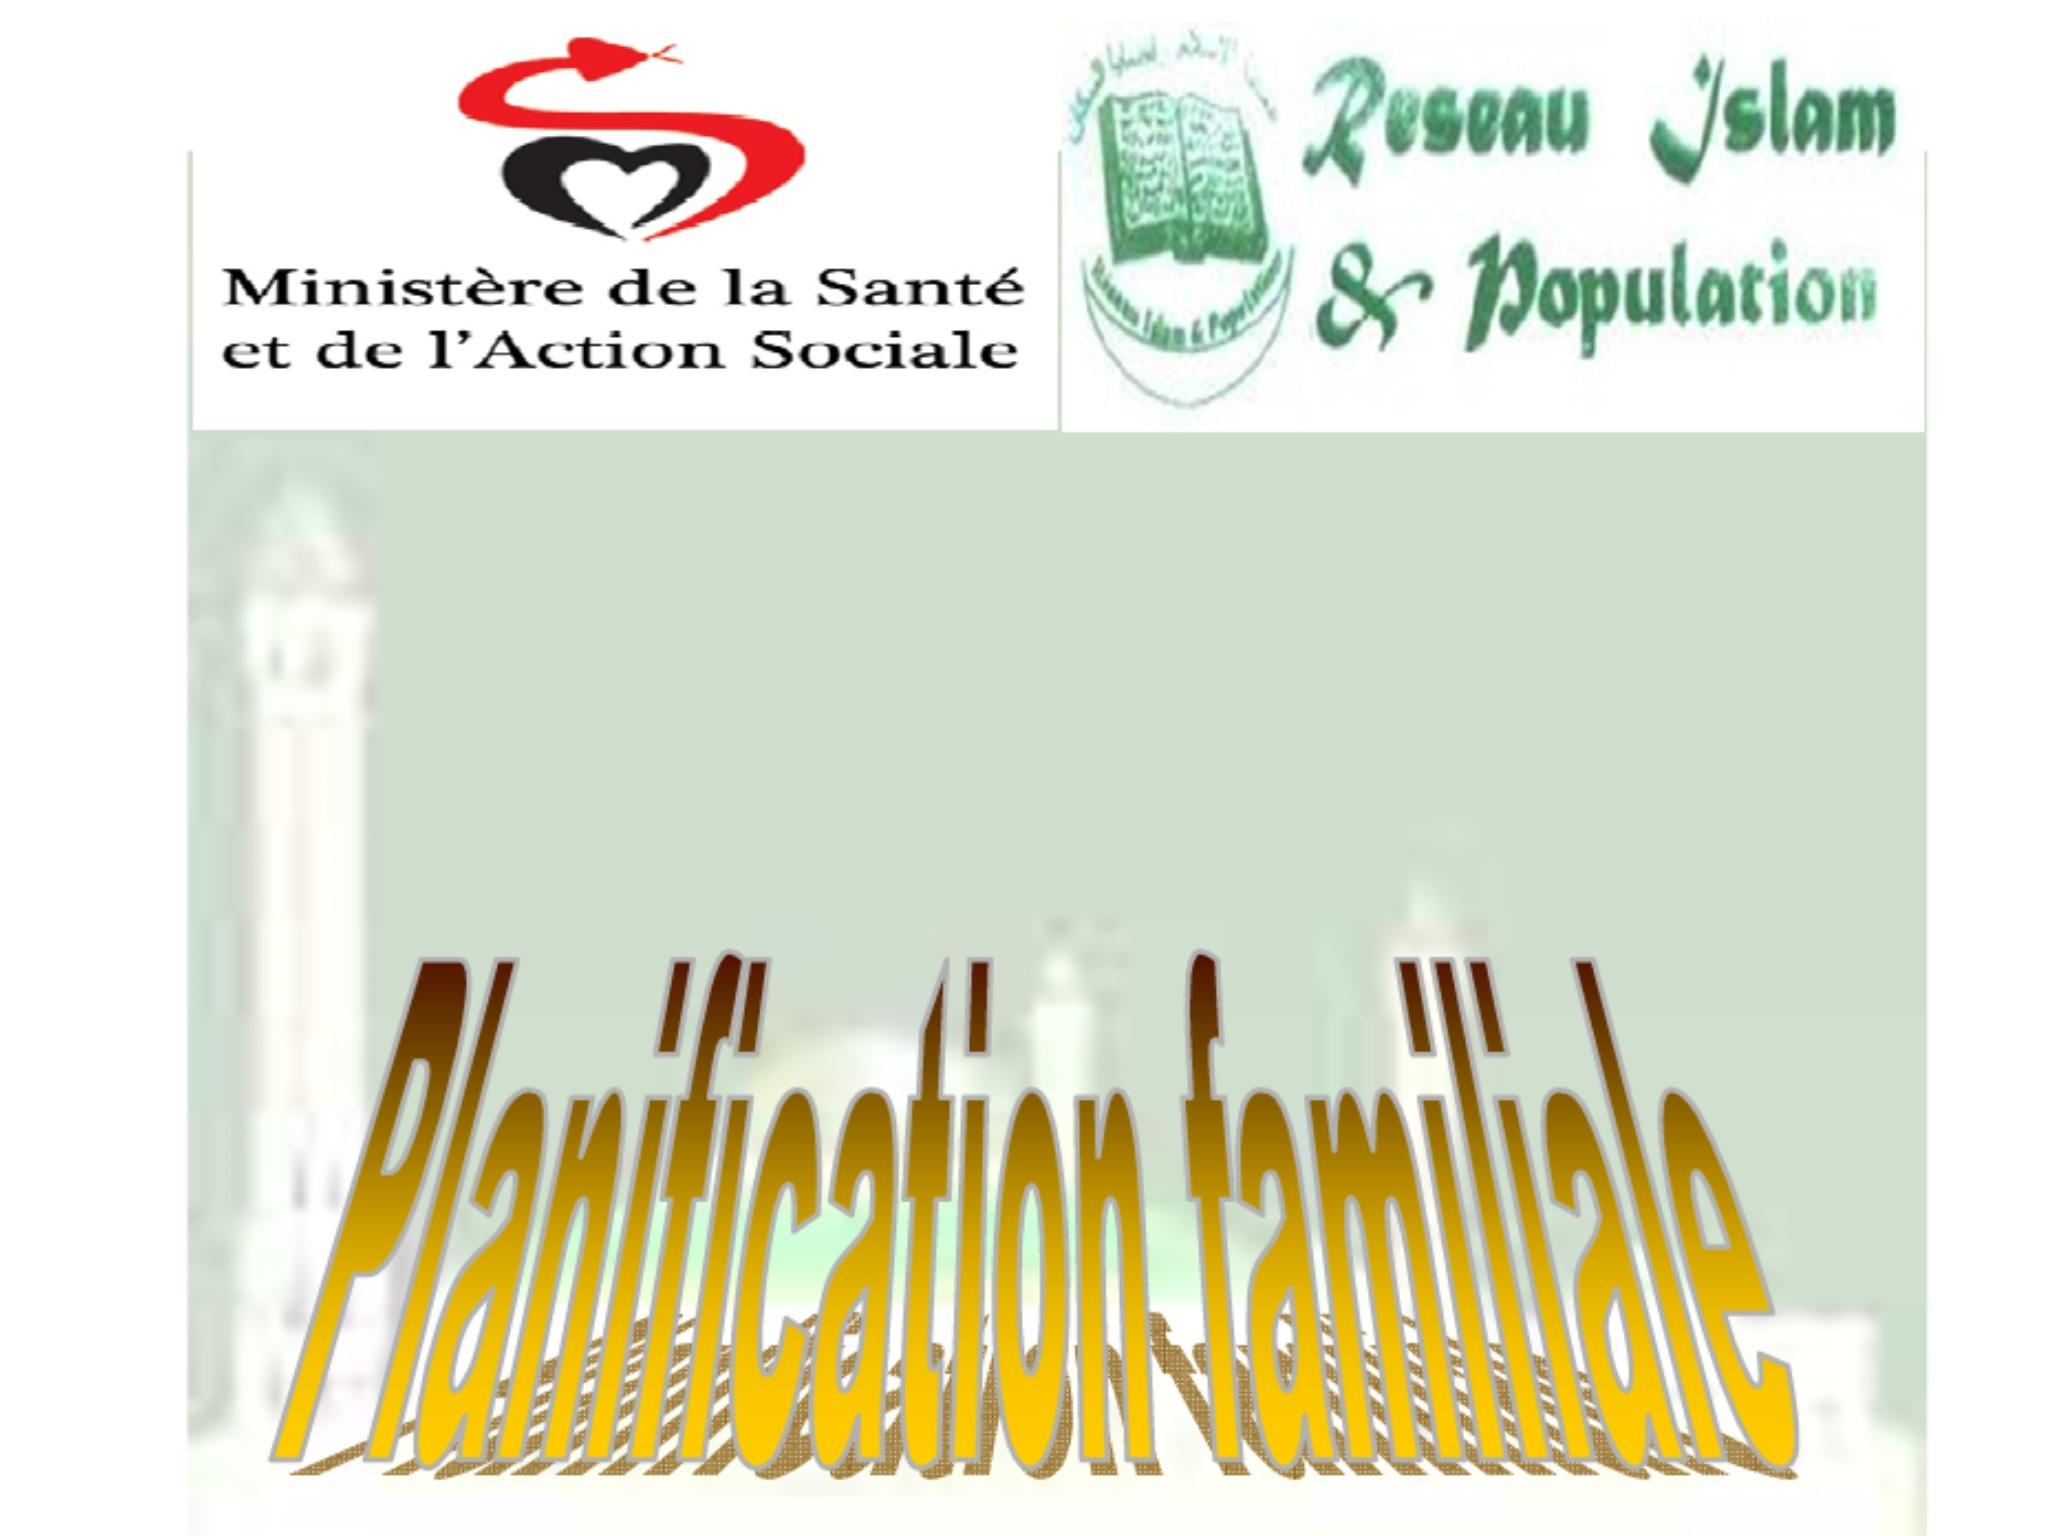 TIVAOUANE : Table Ronde sur la Planification familiale selon la charia et la sounna, Samedi 27 Septembre 2014